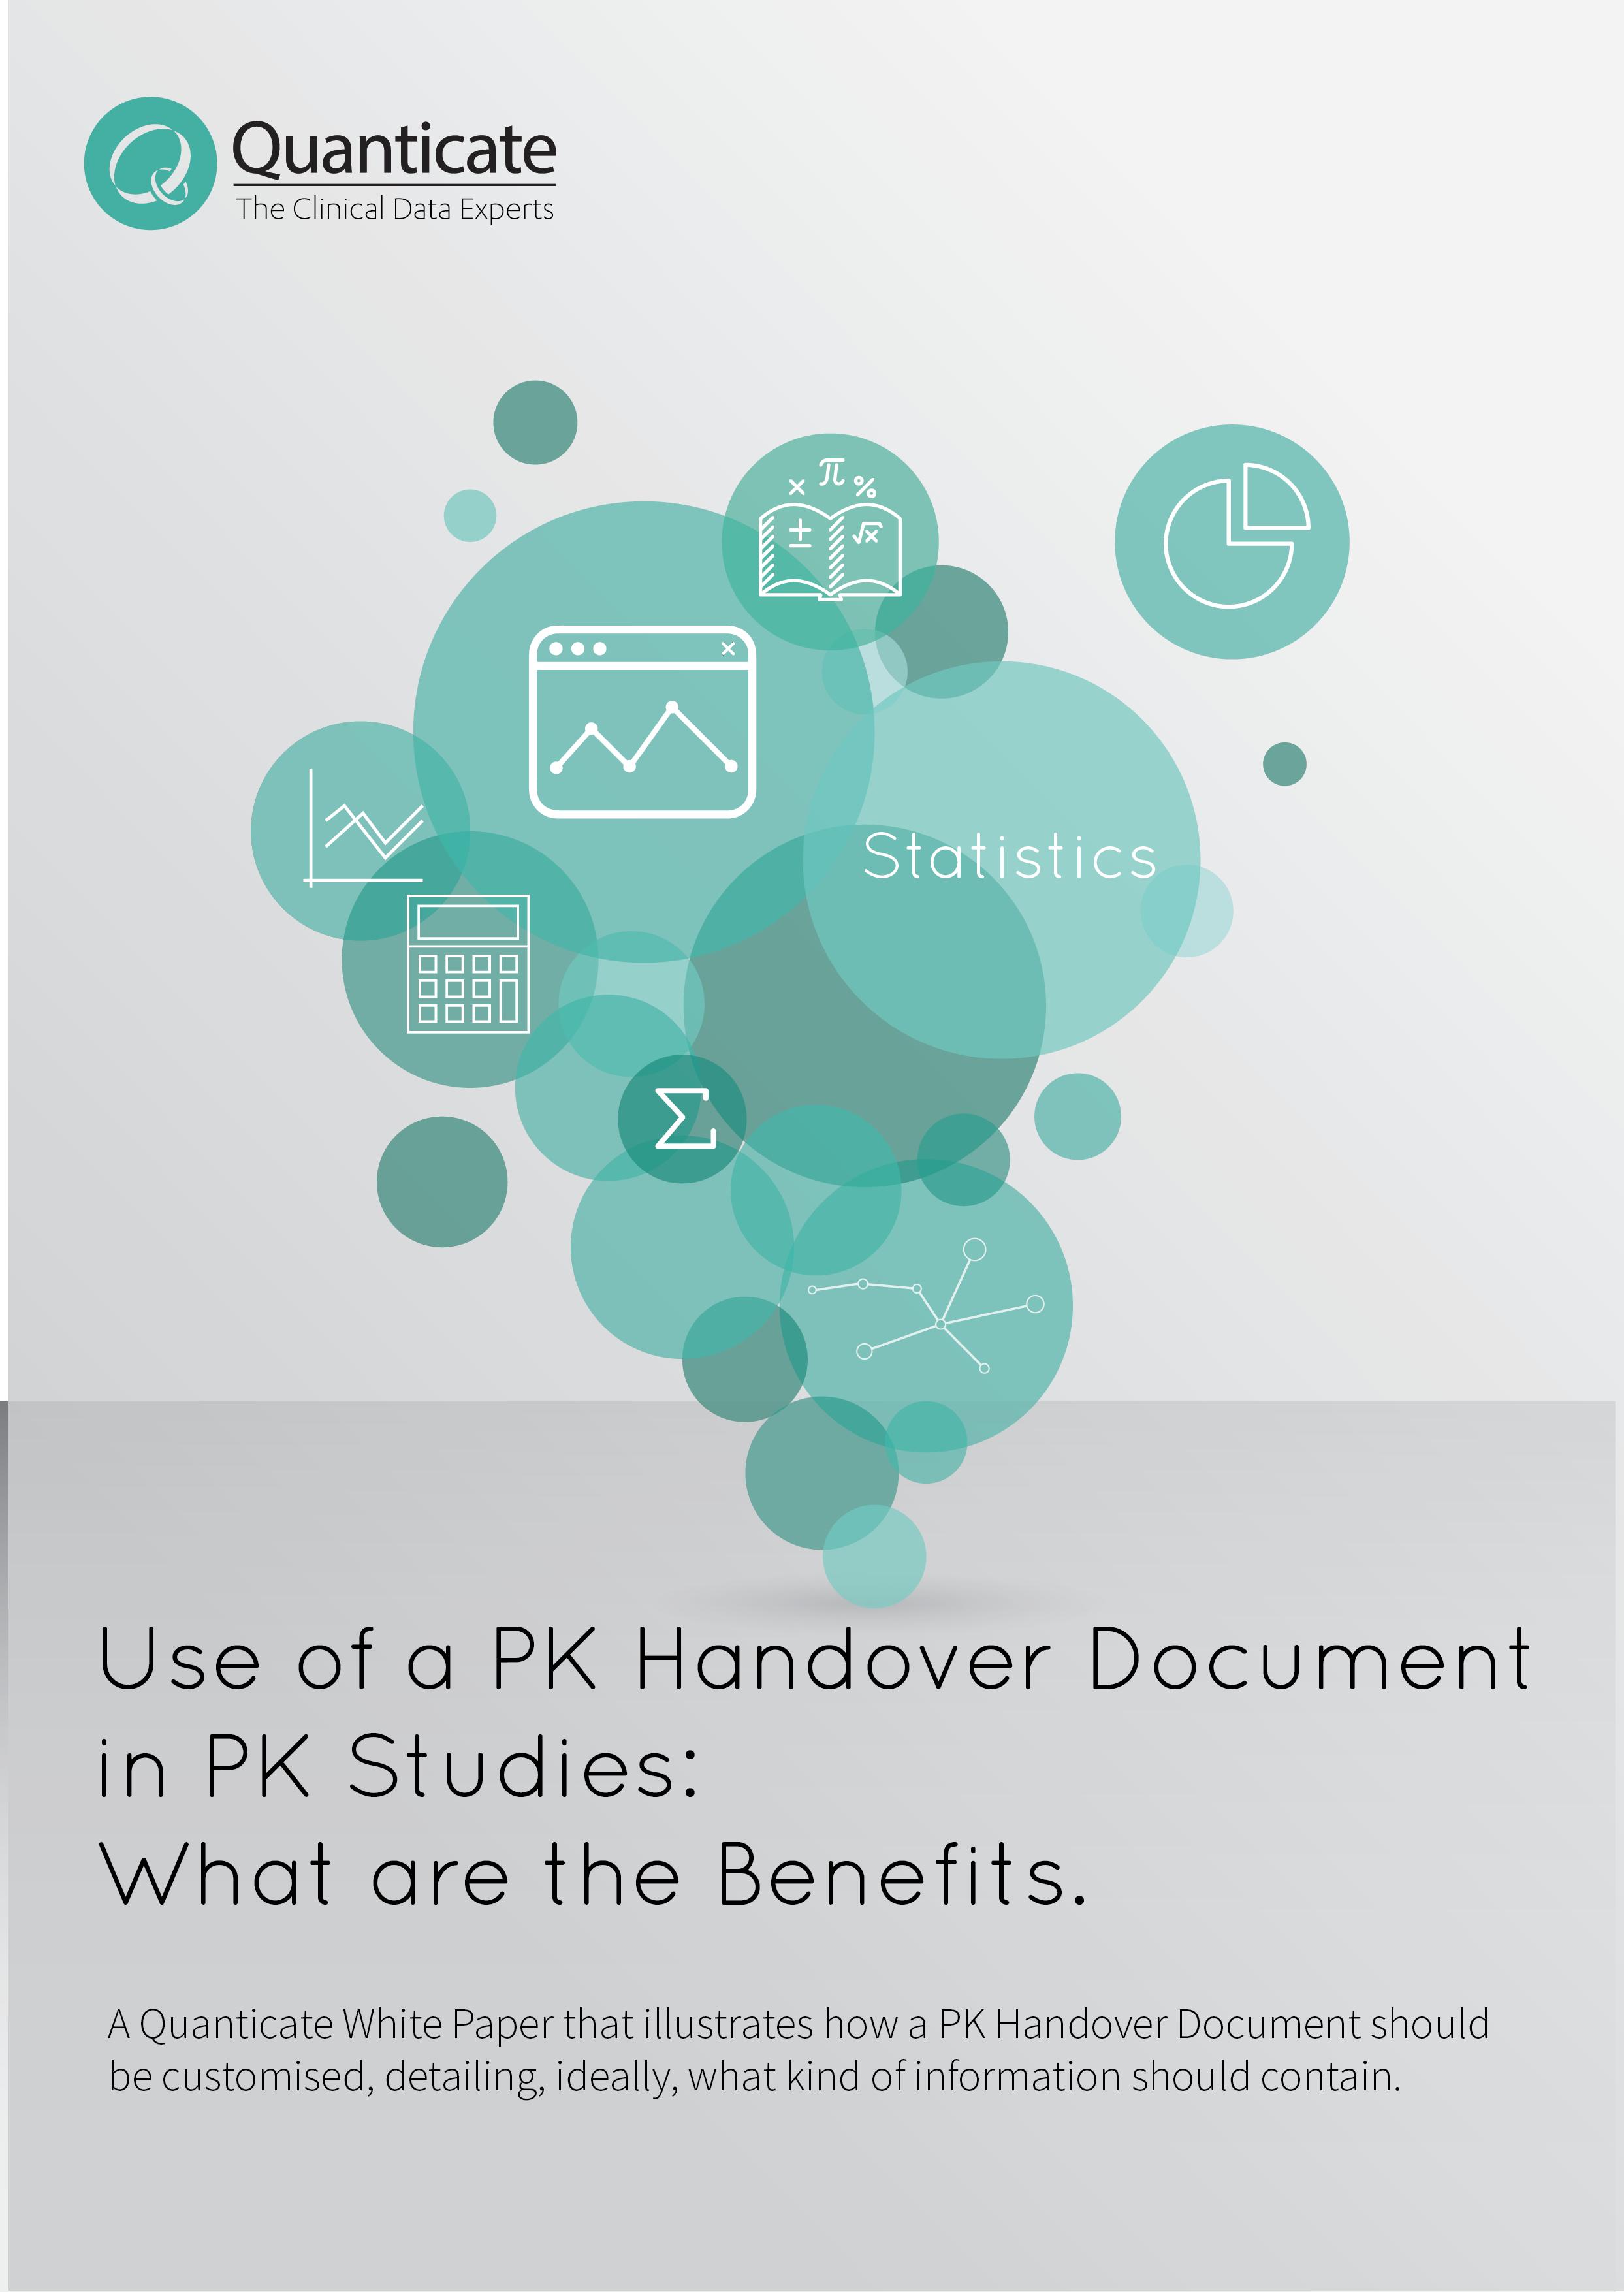 Pharmacokinetics Handover Document in PK Studies